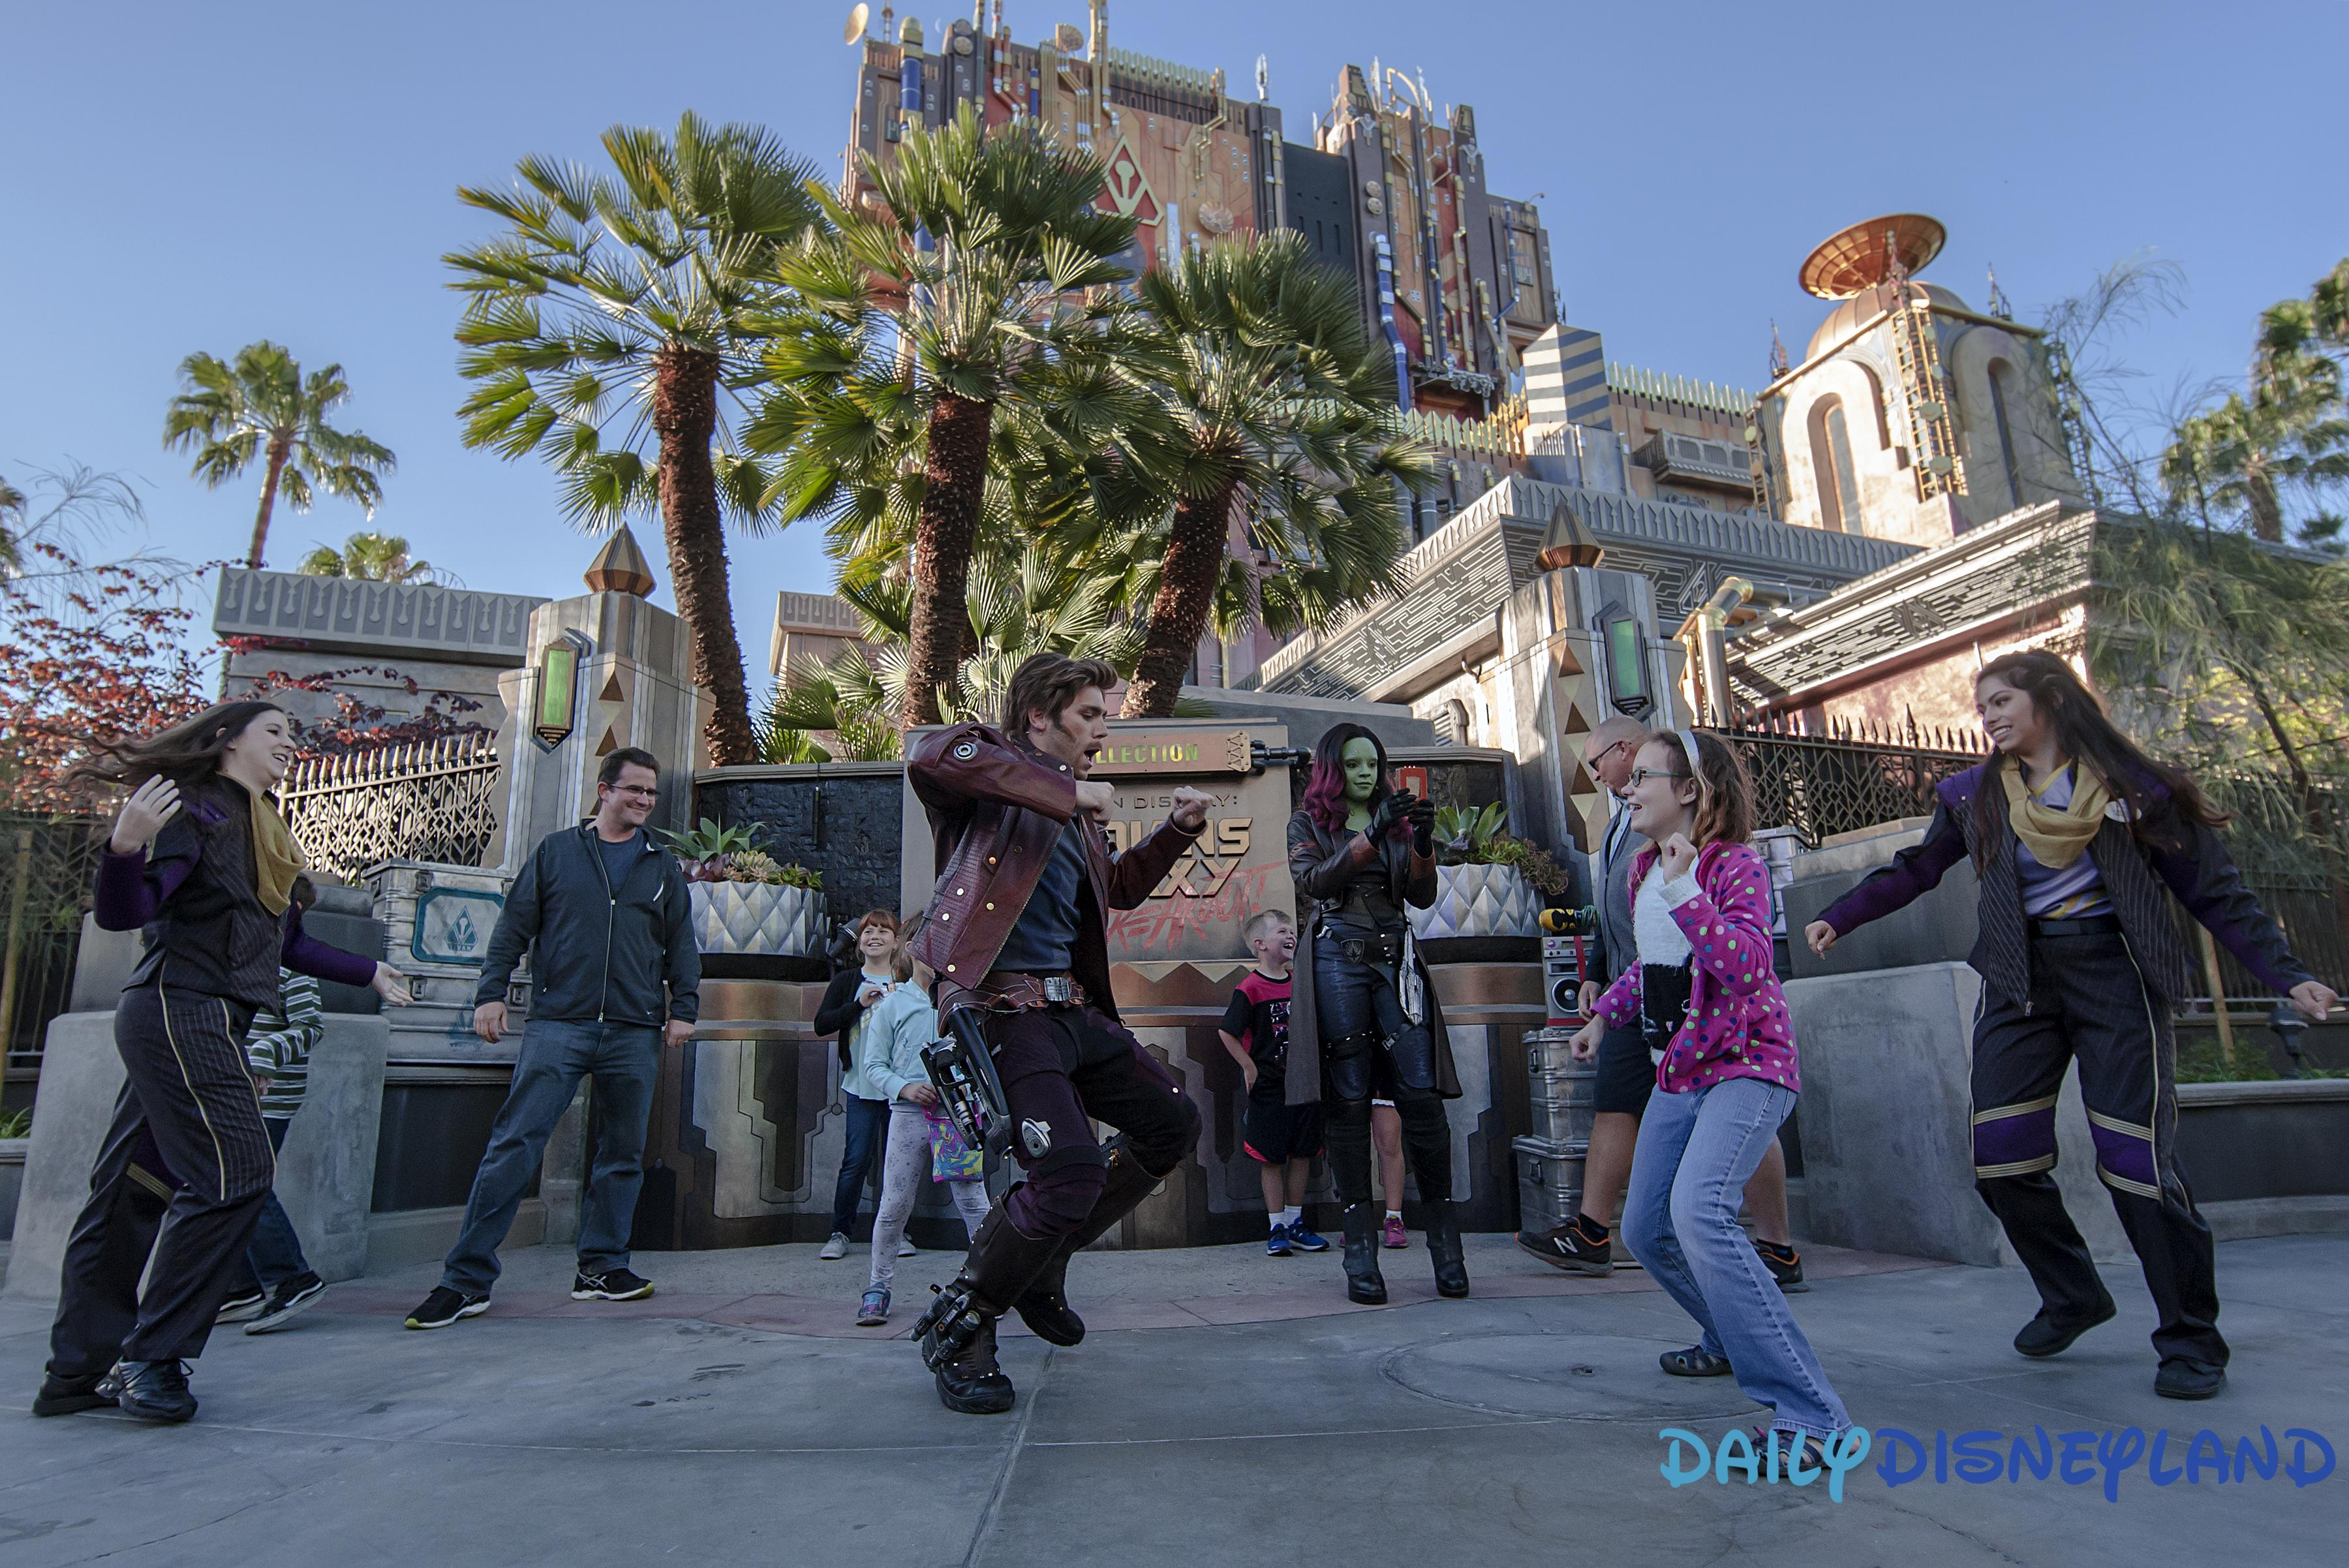 gardiens de la galaxie marvel disney california adventure disneyland resort